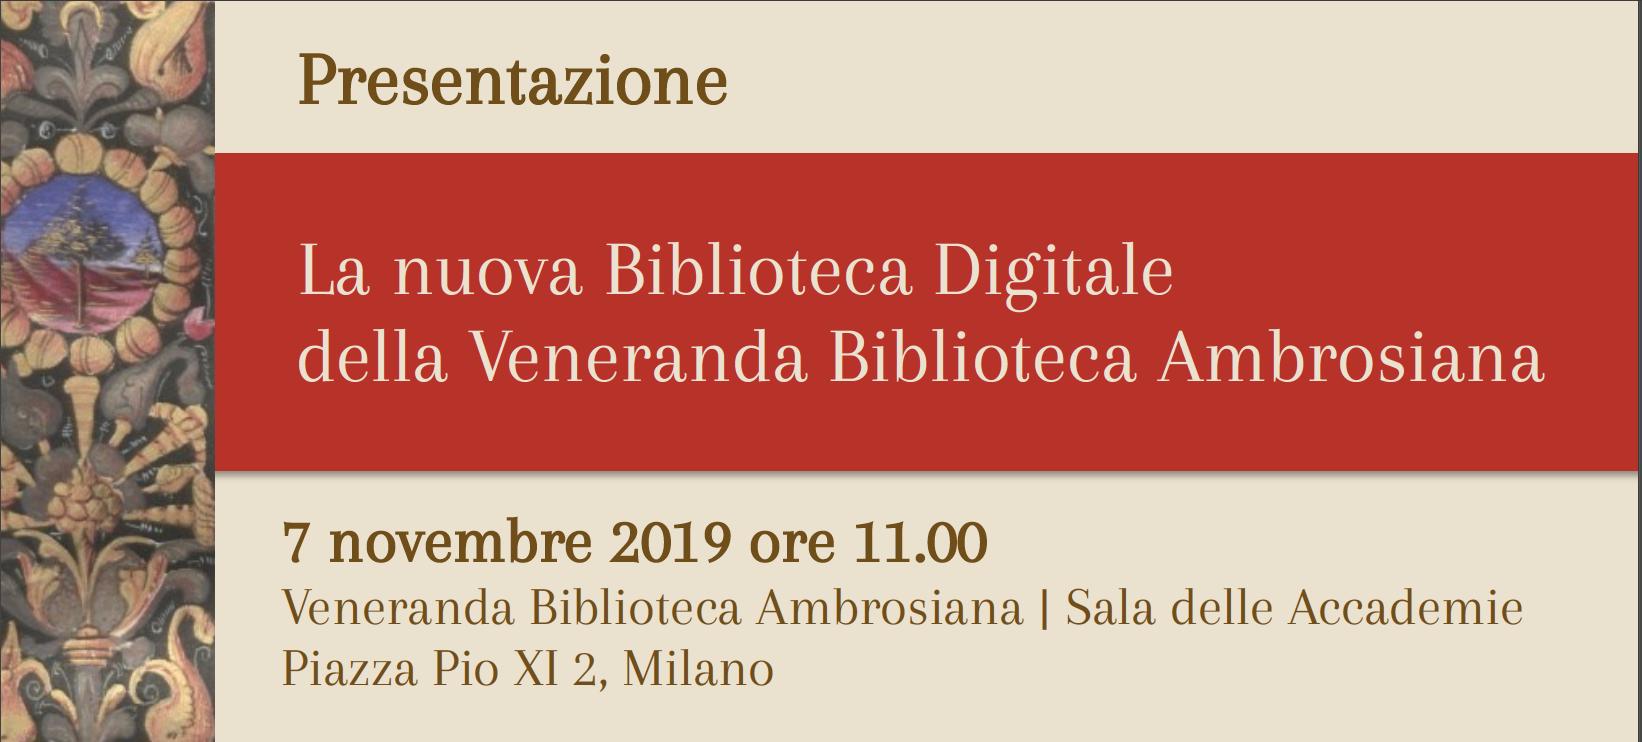 Nuova Biblioteca Digitale Ambrosiana